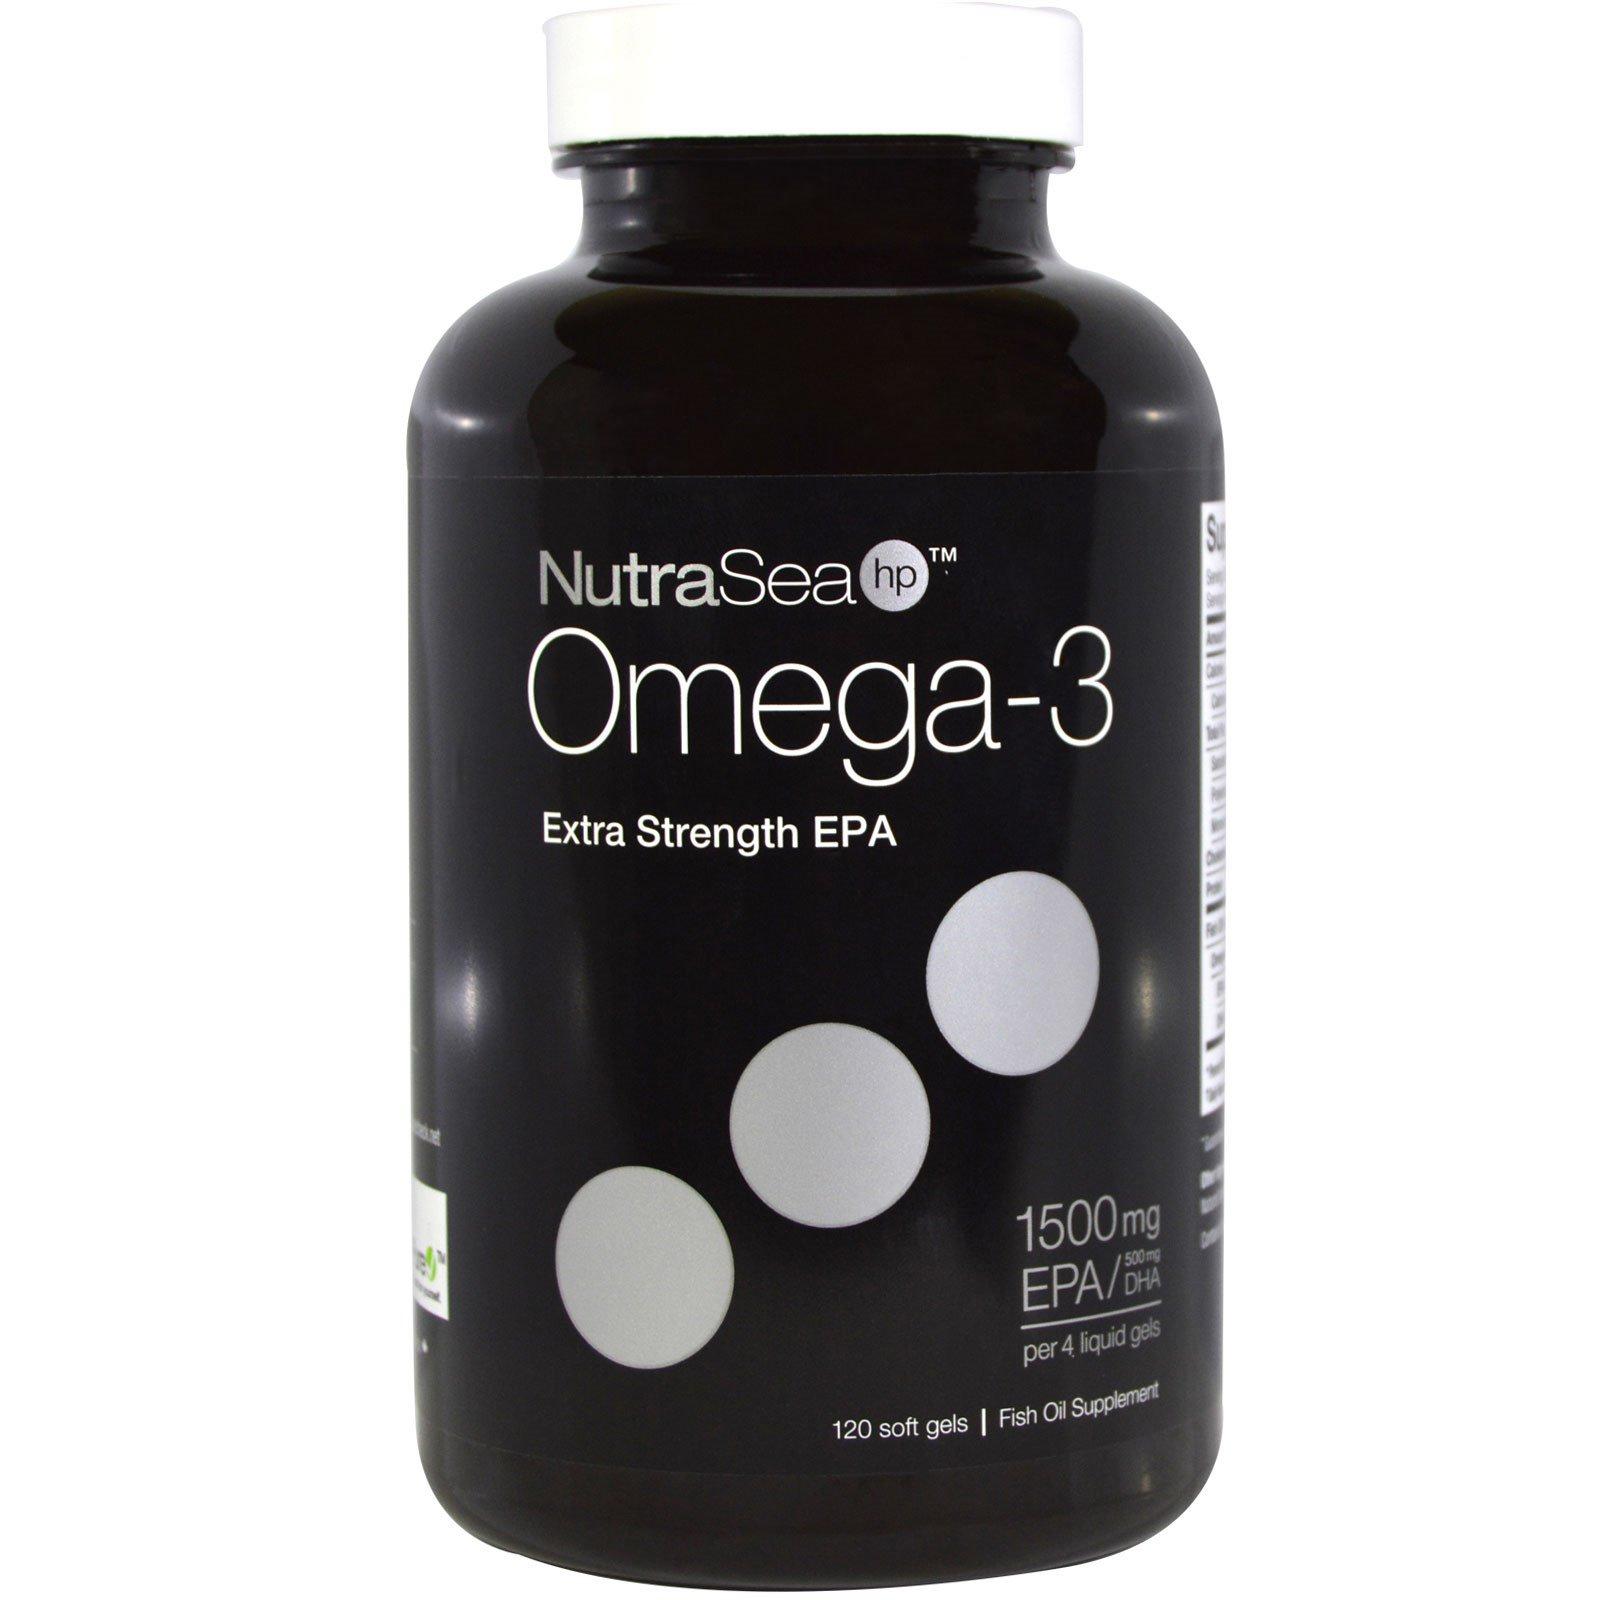 Ascenta, NutraSea hp, Omega-3, Extra Strength EPA, Lemon Flavor, 120 Softgels